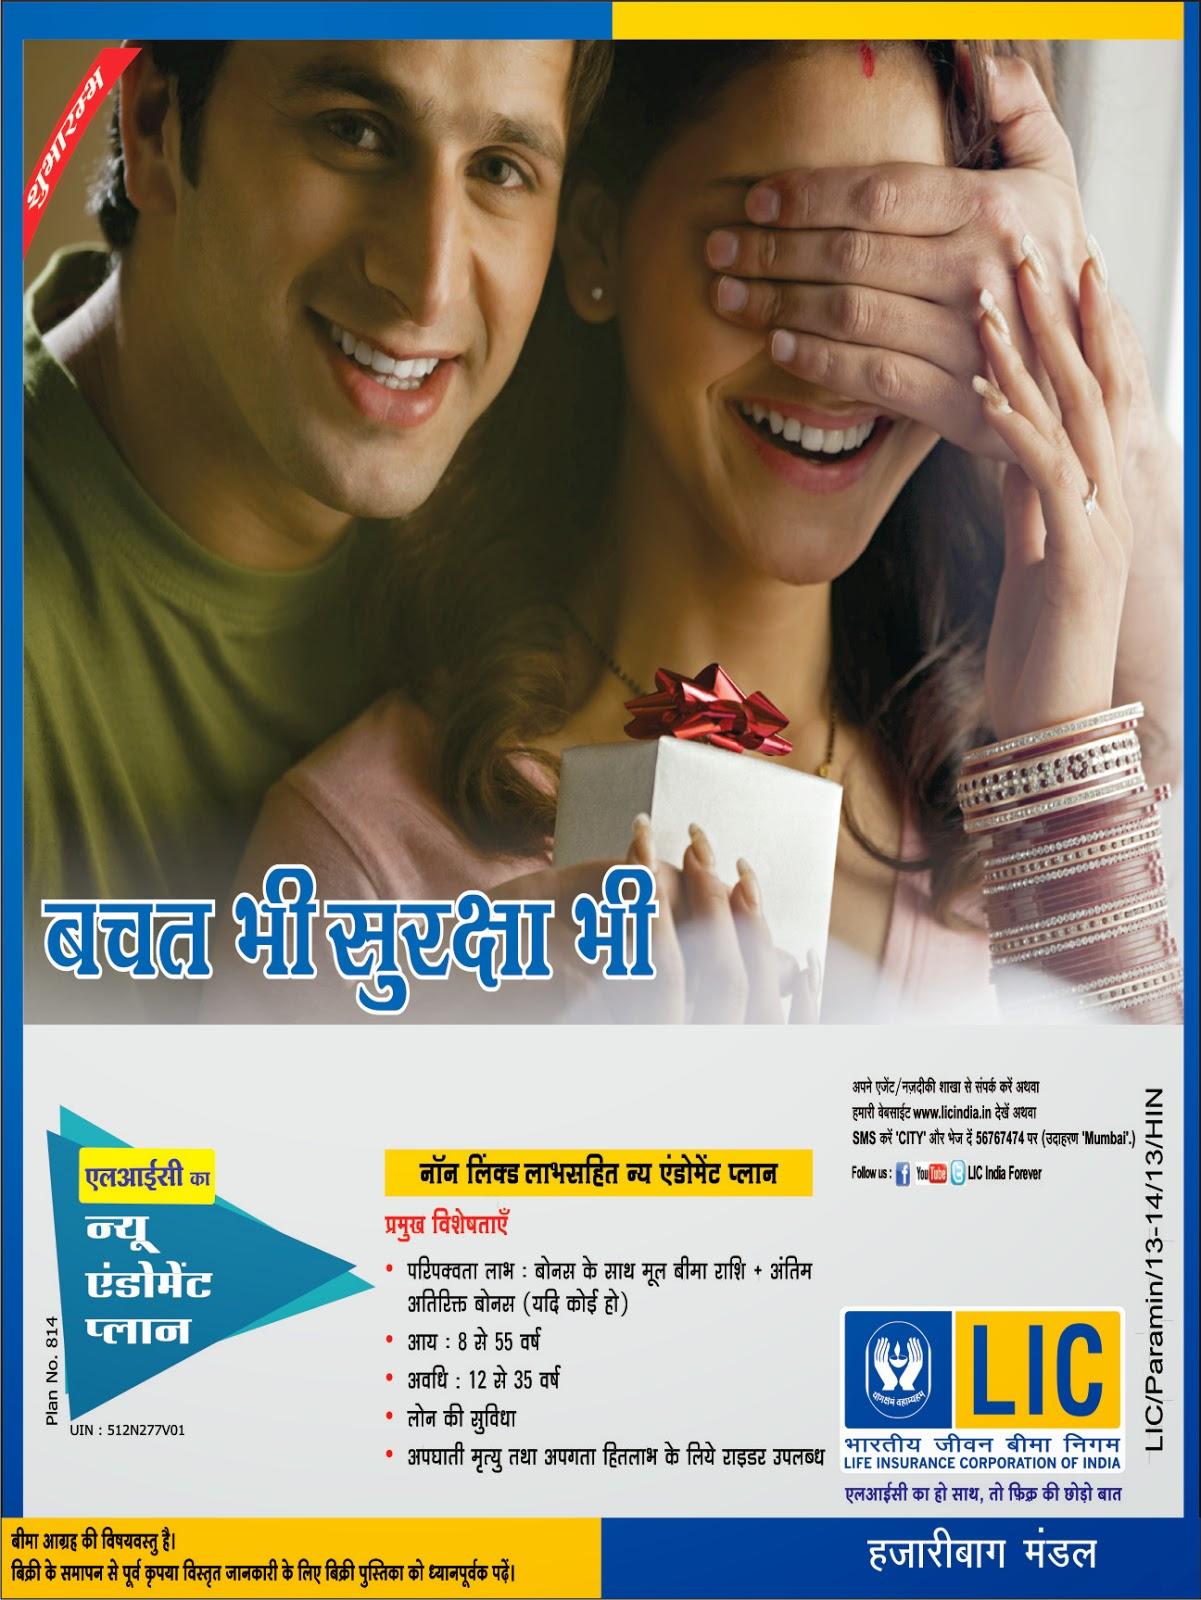 Lic jeevan akshay 6 benefits of dating 5